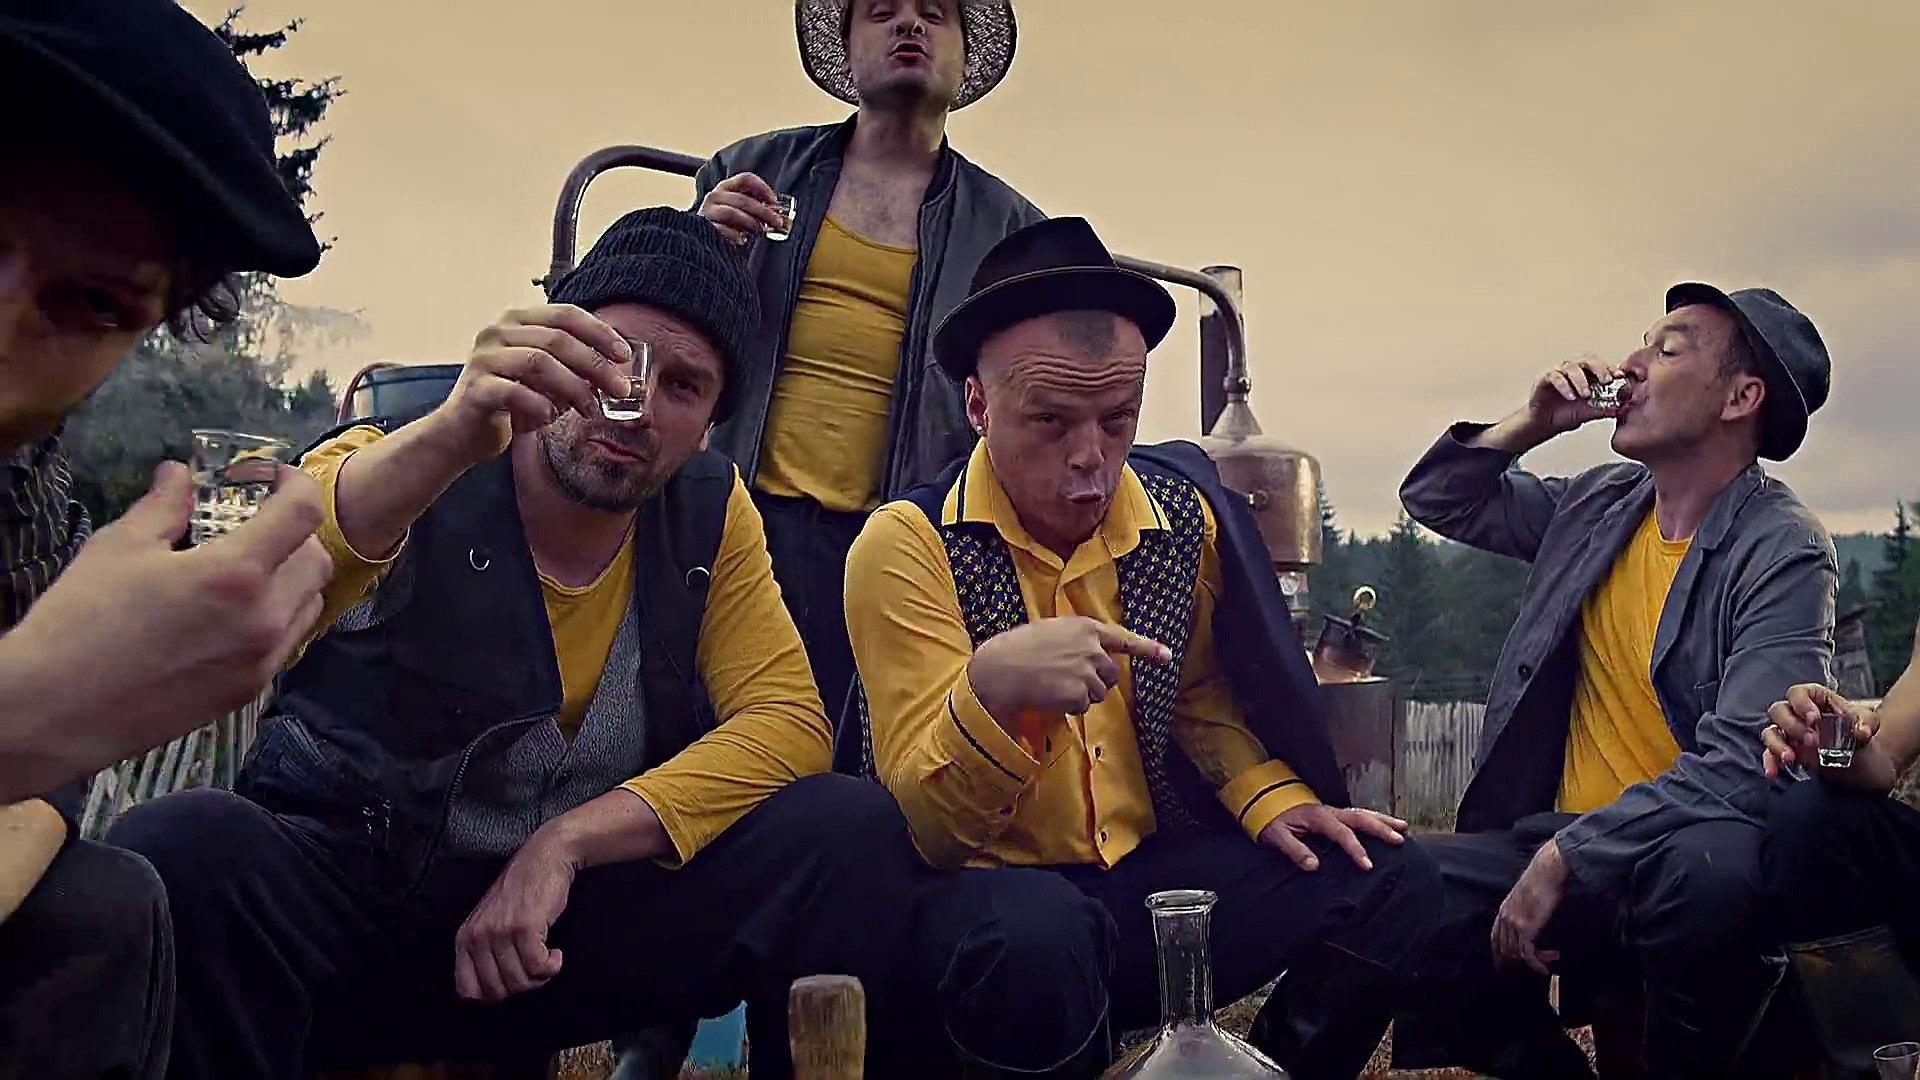 Dubioza kolektiv - No Escape (from Balkan) - Official Video -2014